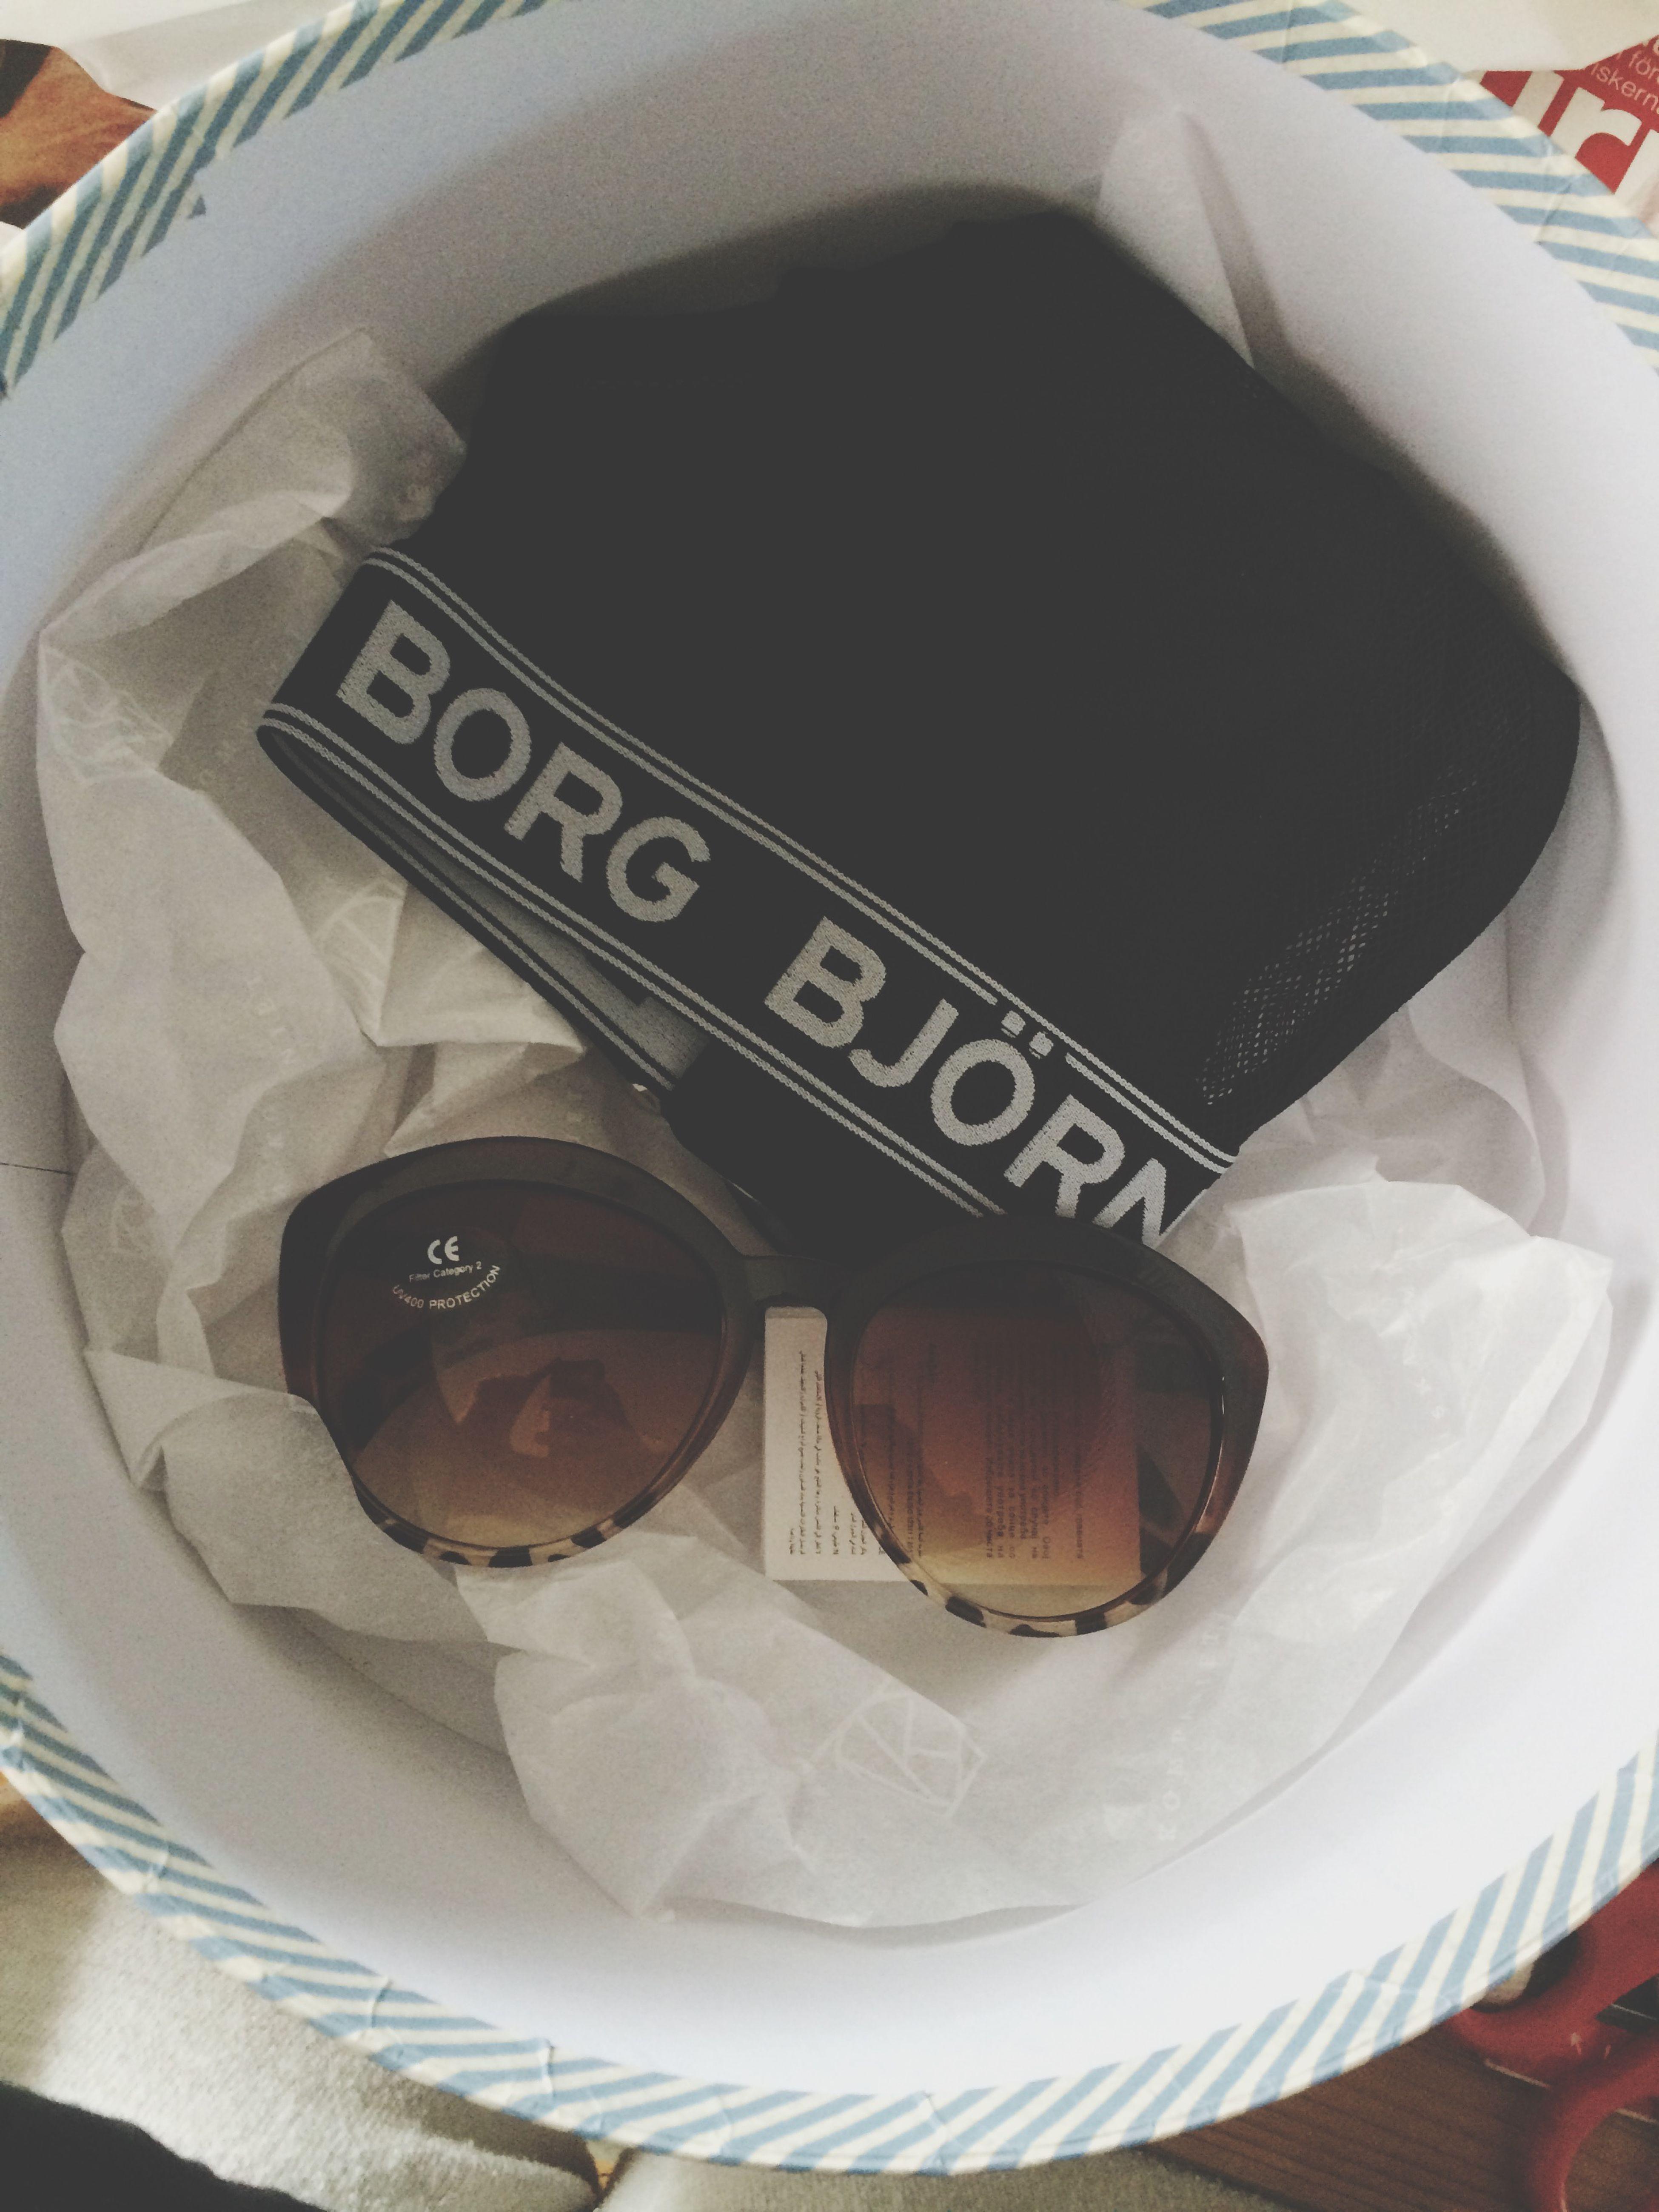 Birthday Giftift] Fashion Bjornborg Getting Inspired Gift To Bestie